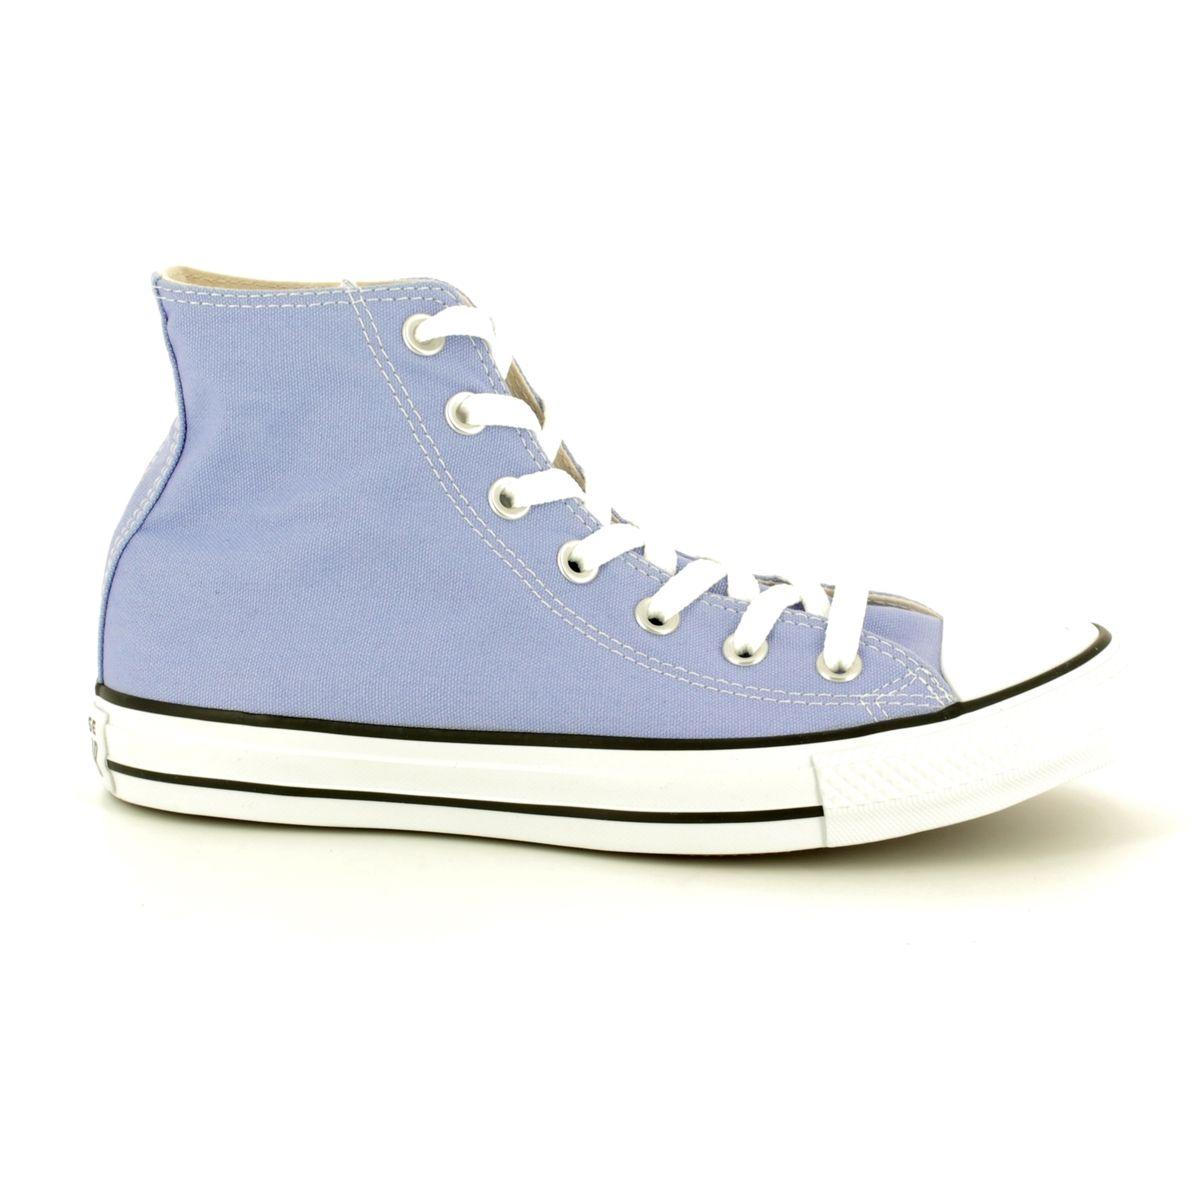 Twilight Converse Shoes